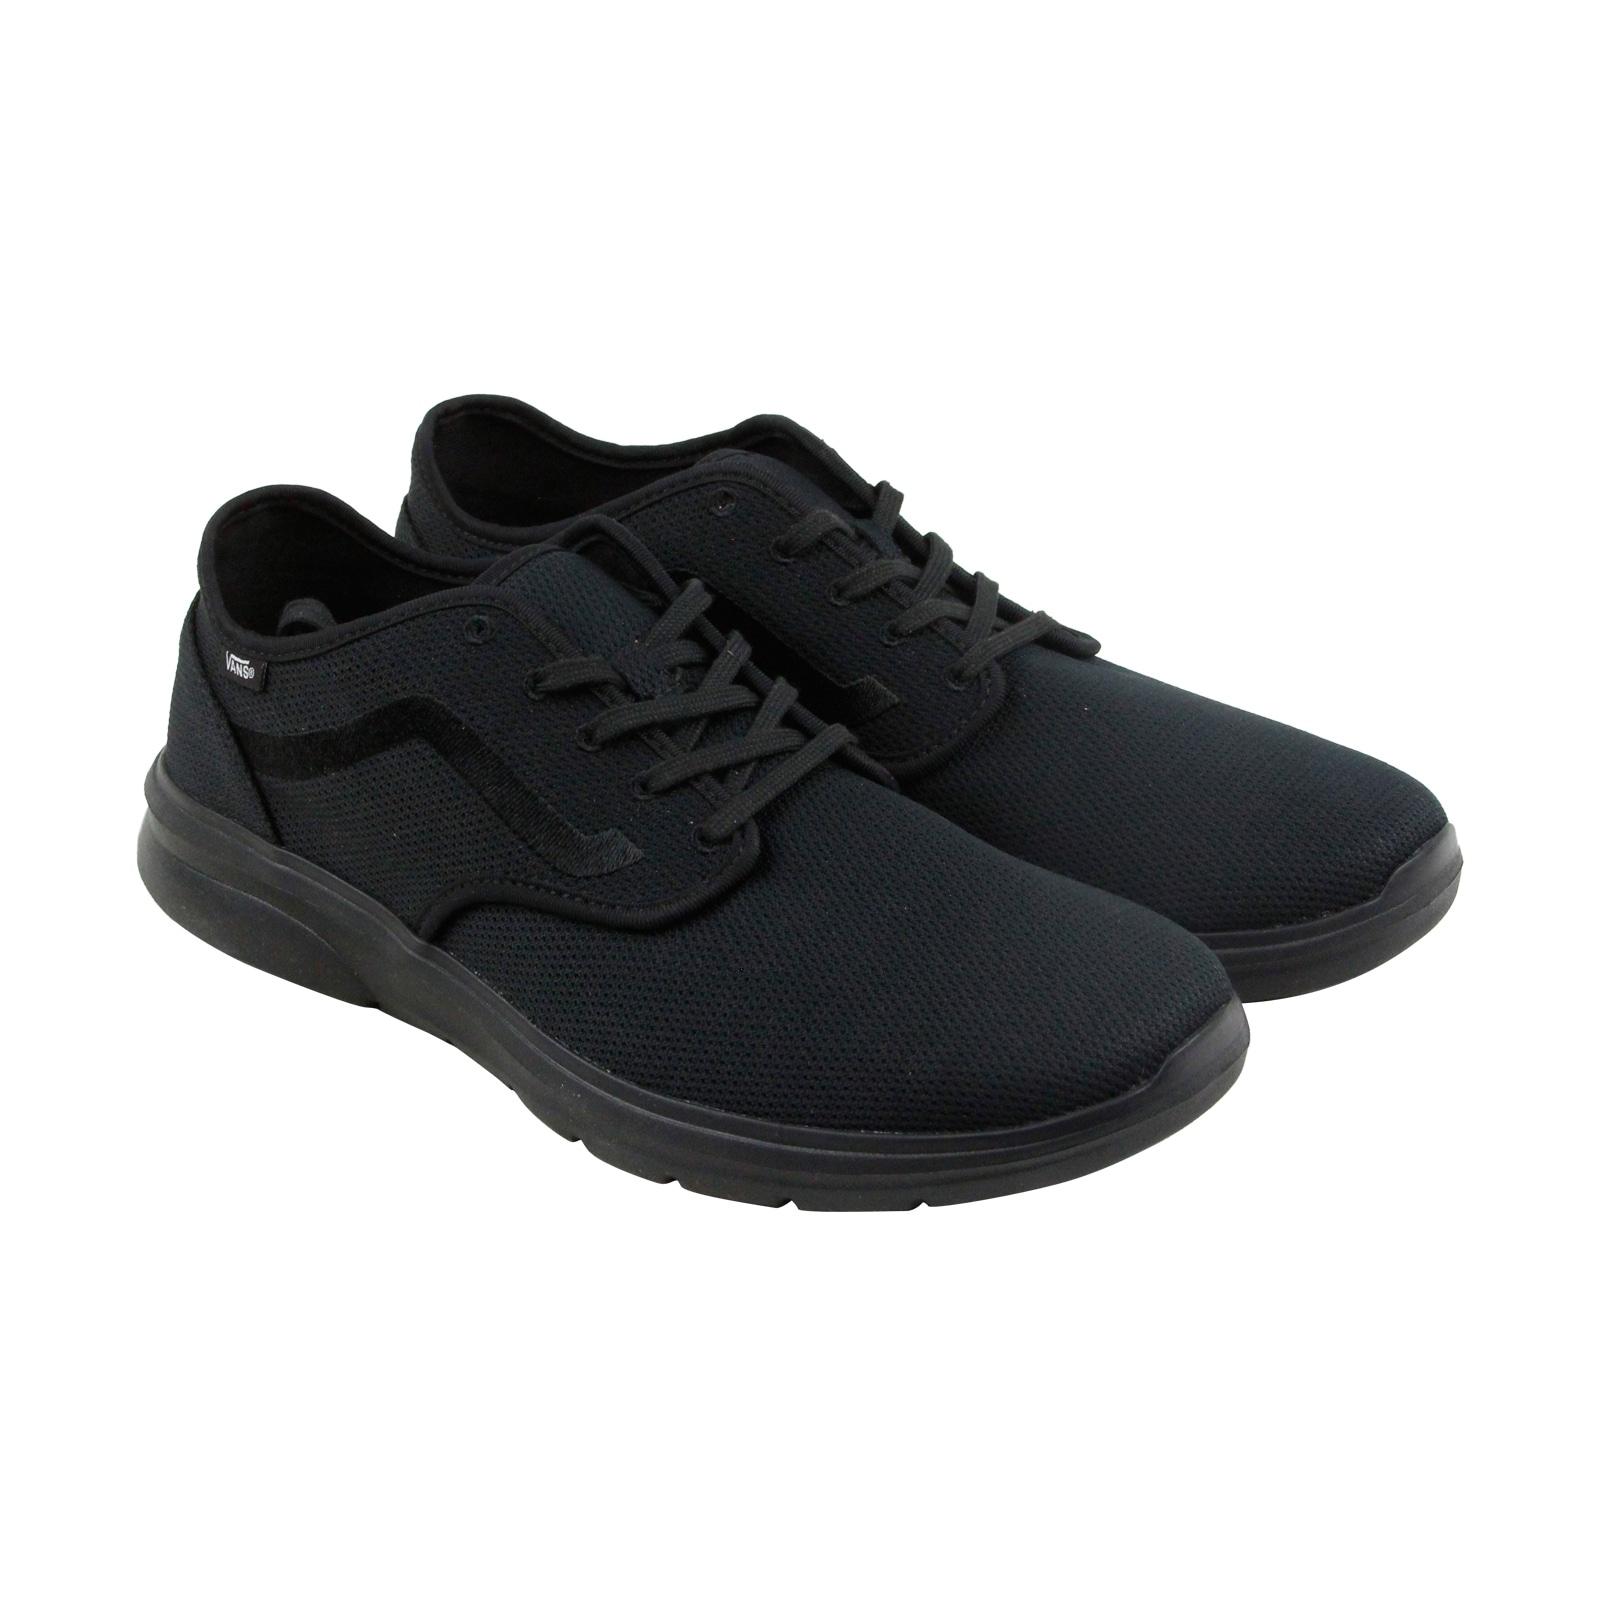 ba18501a095e34 Shop Vans Iso 2 Mens Black Mesh Athletic Lace Up Running Shoes ...